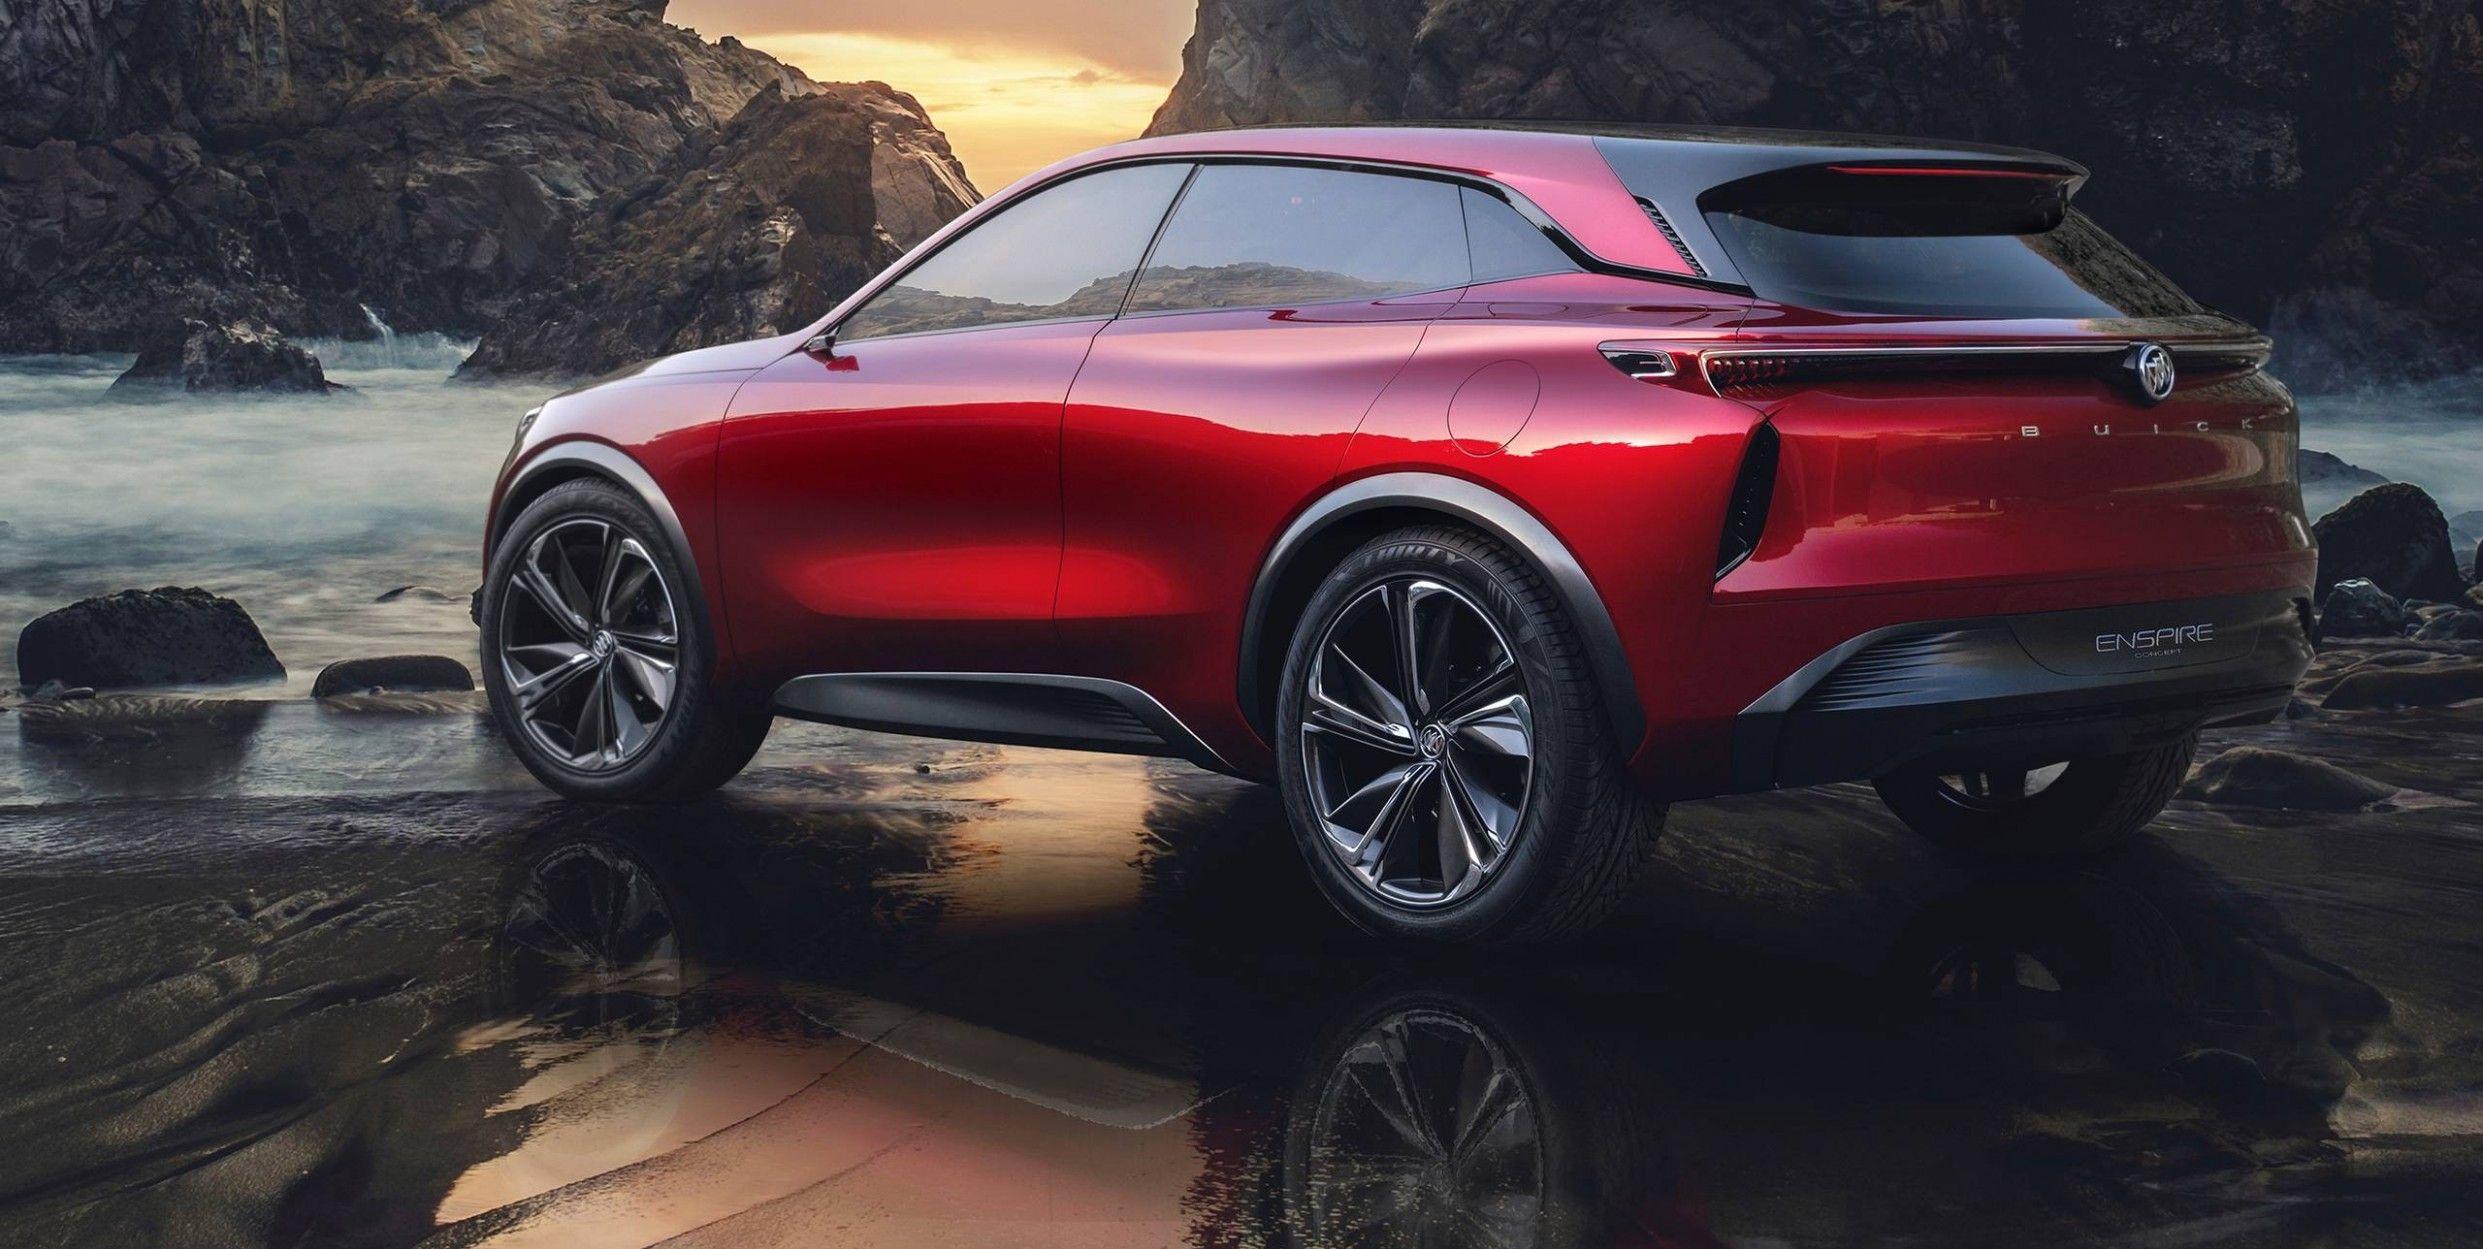 2021 Buick Riviera Spy in 2020 Buick, Suv, Buick riviera